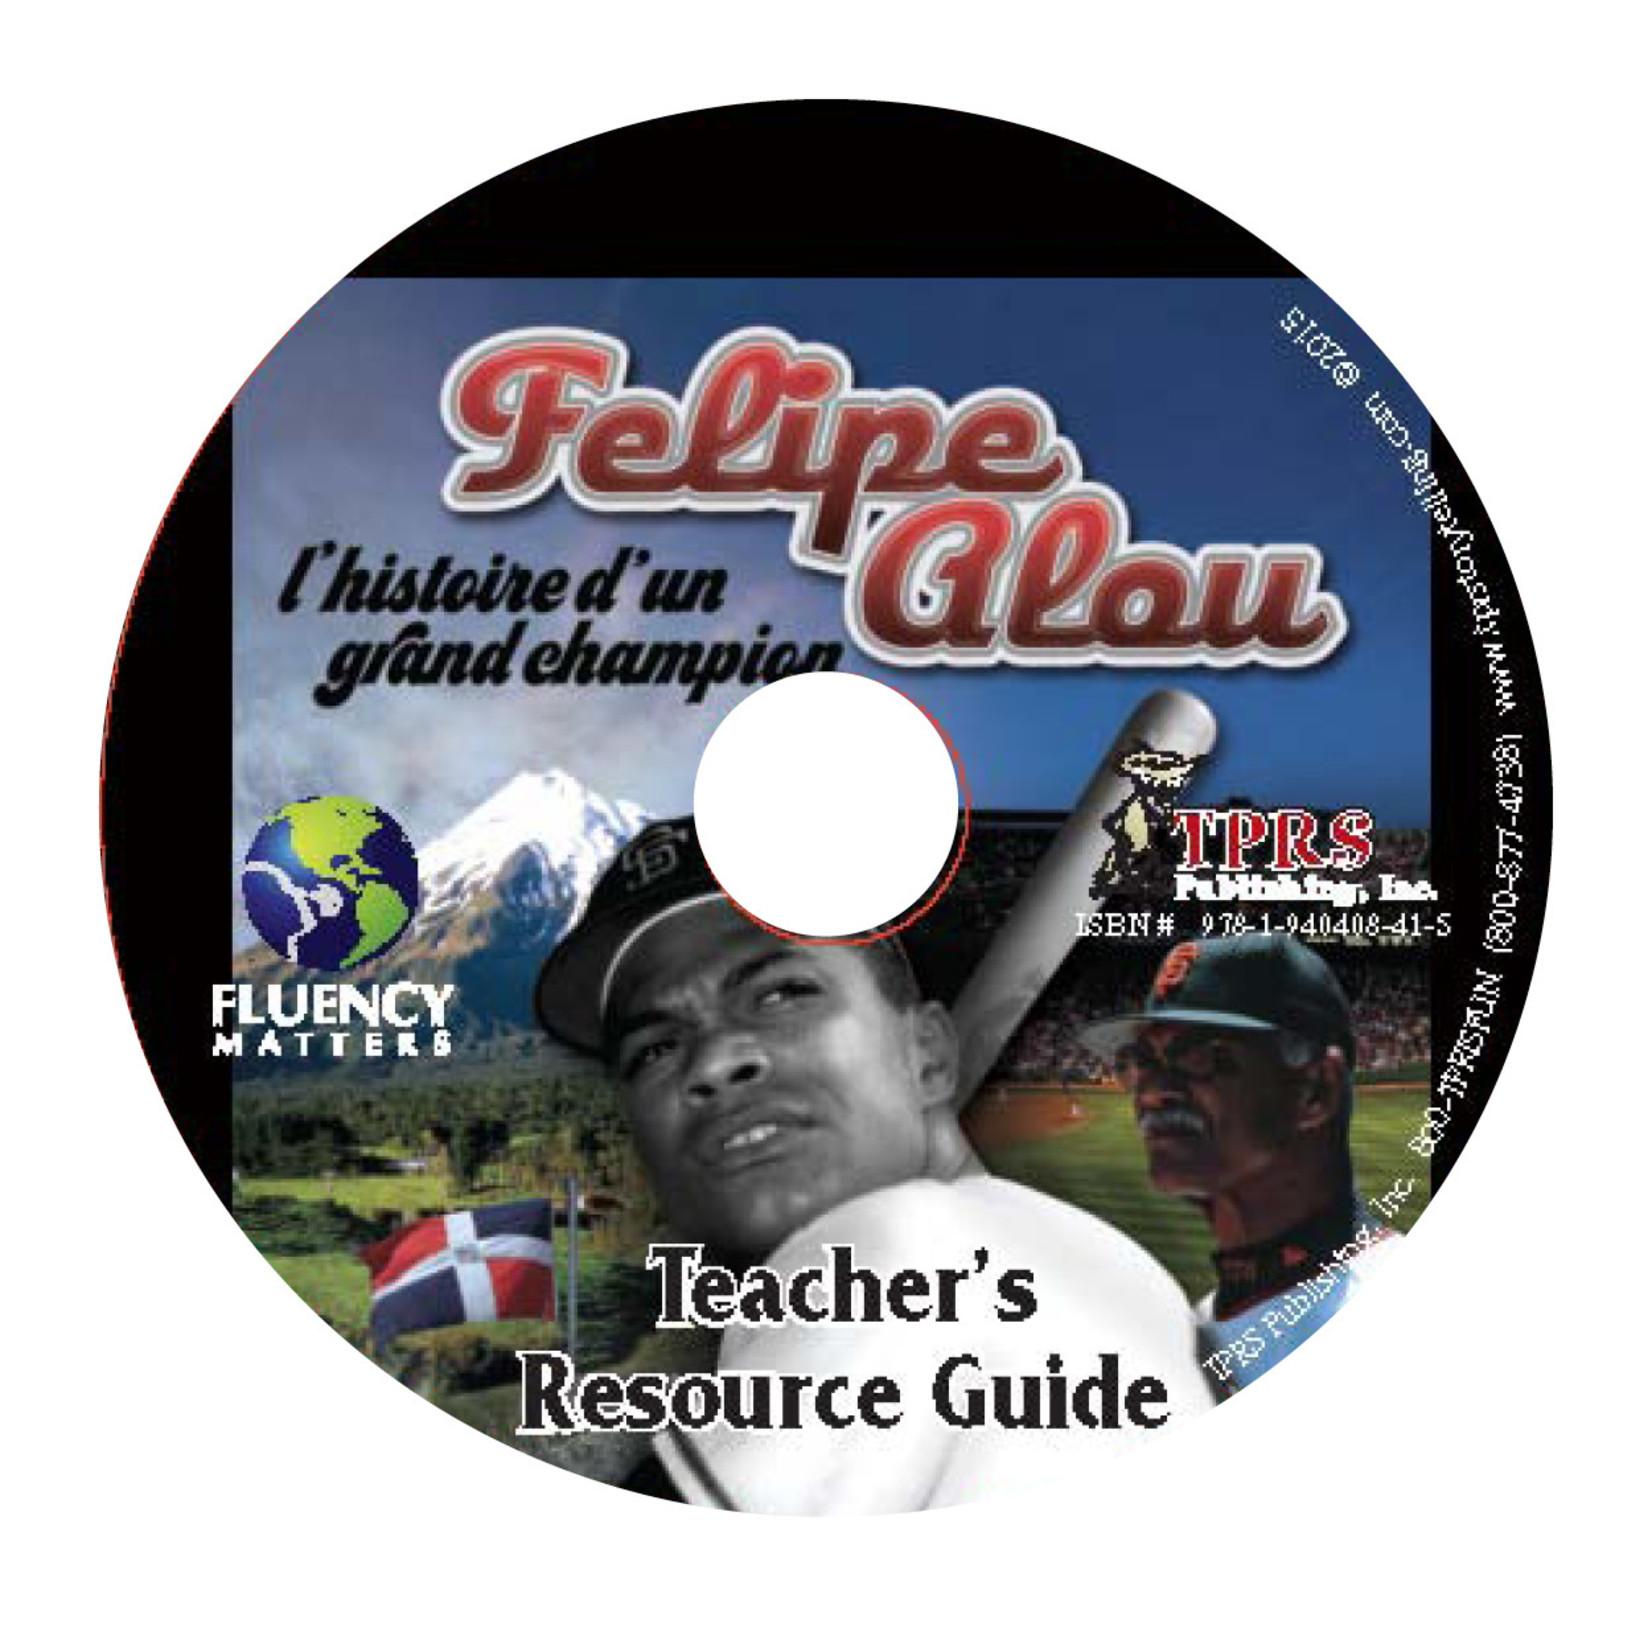 Fluency Matters Felipe Alou: l'histoire d'un grand champion  - Docentenhandleiding